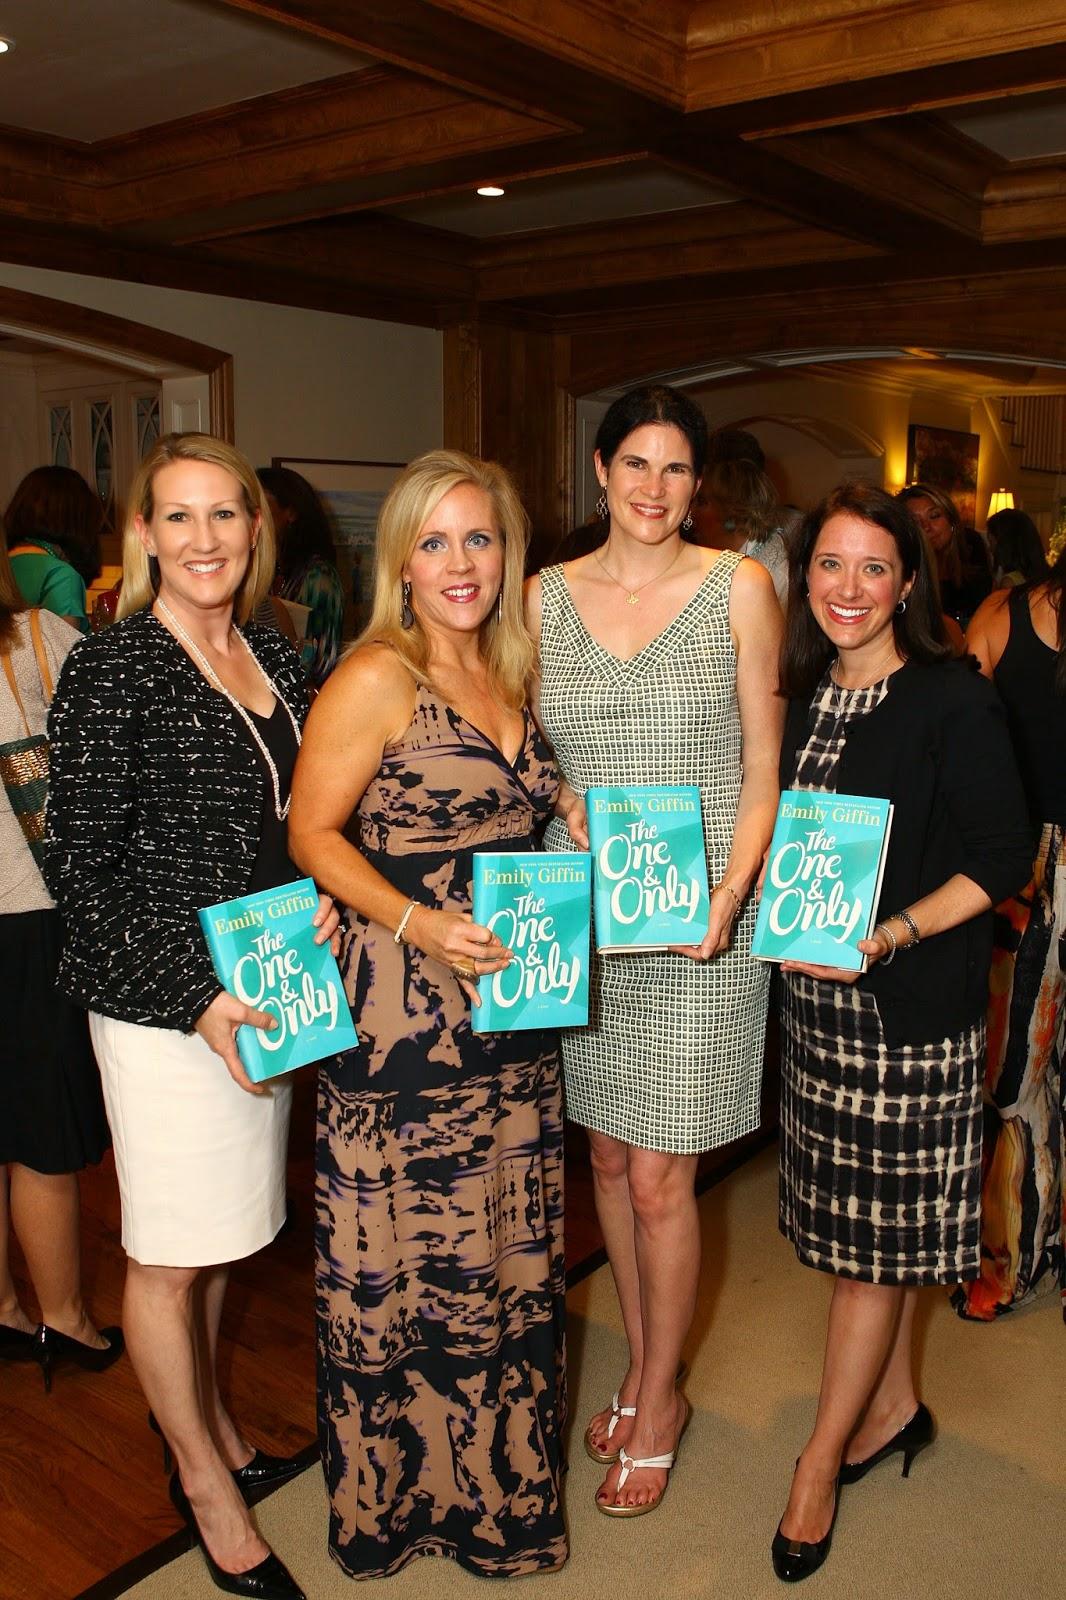 RSVP Calendar Author Emily Giffin Joins Community